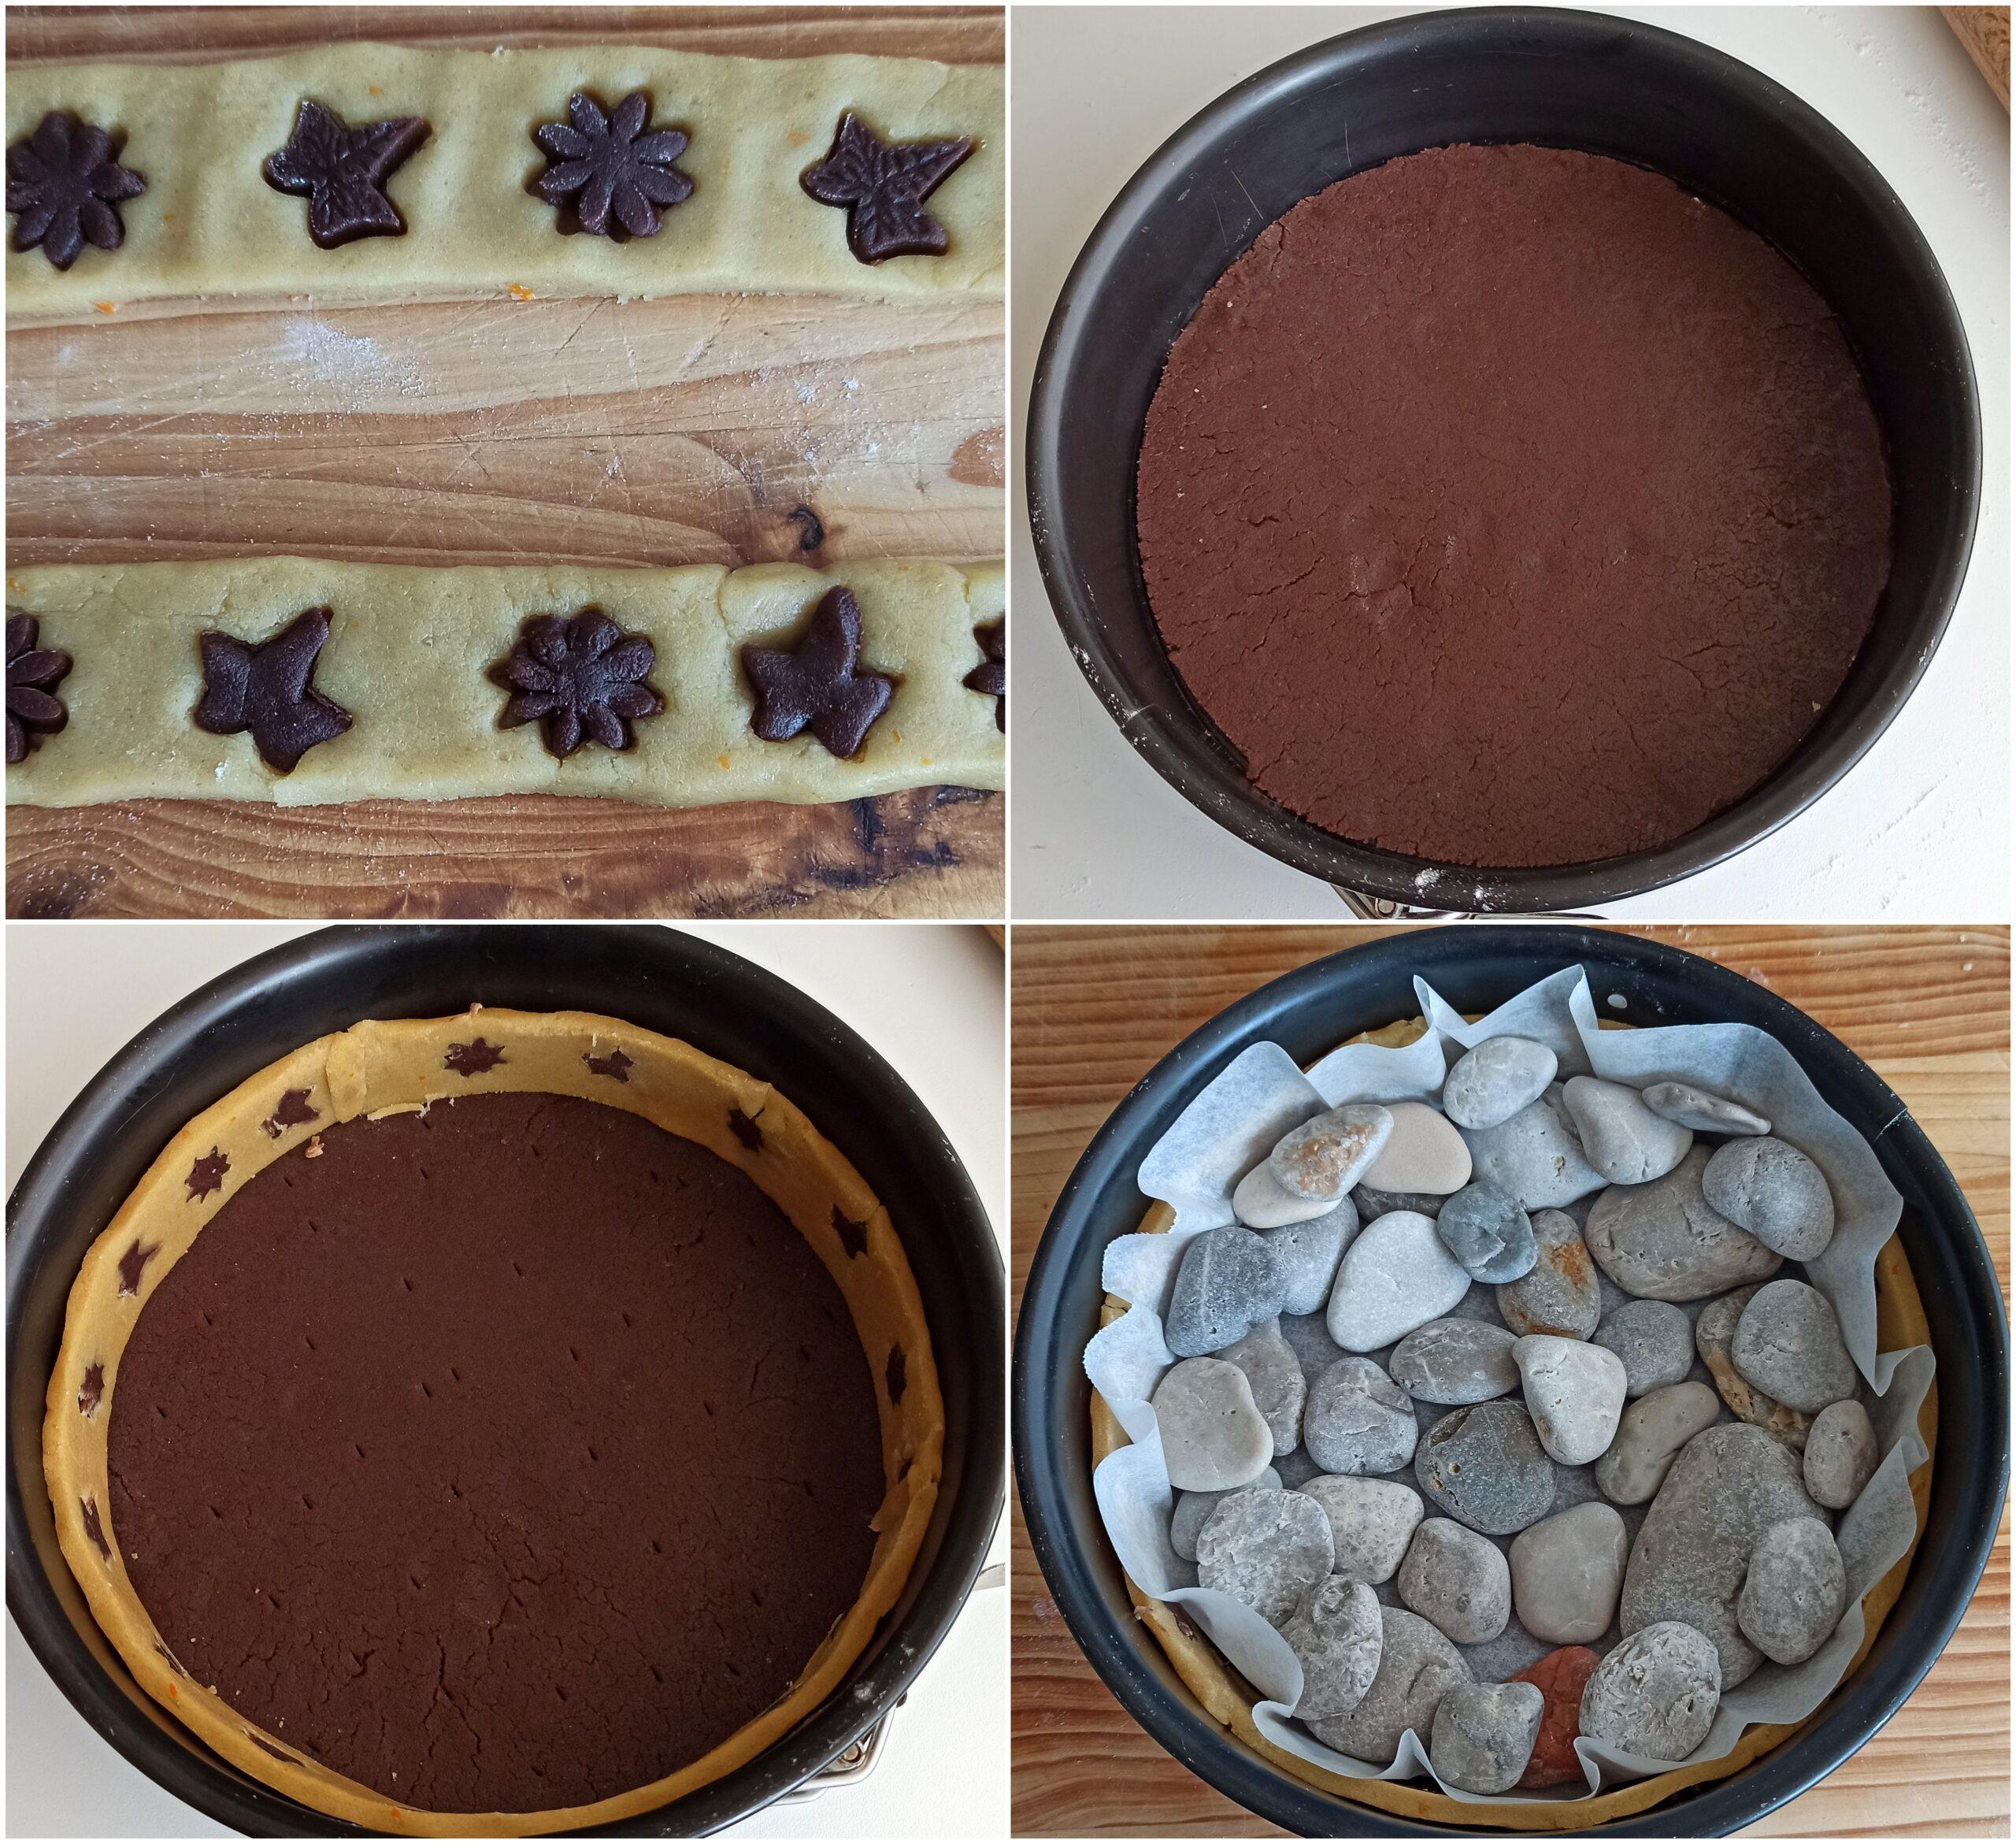 Orange tart senza glutine - La Cassata Celiaca